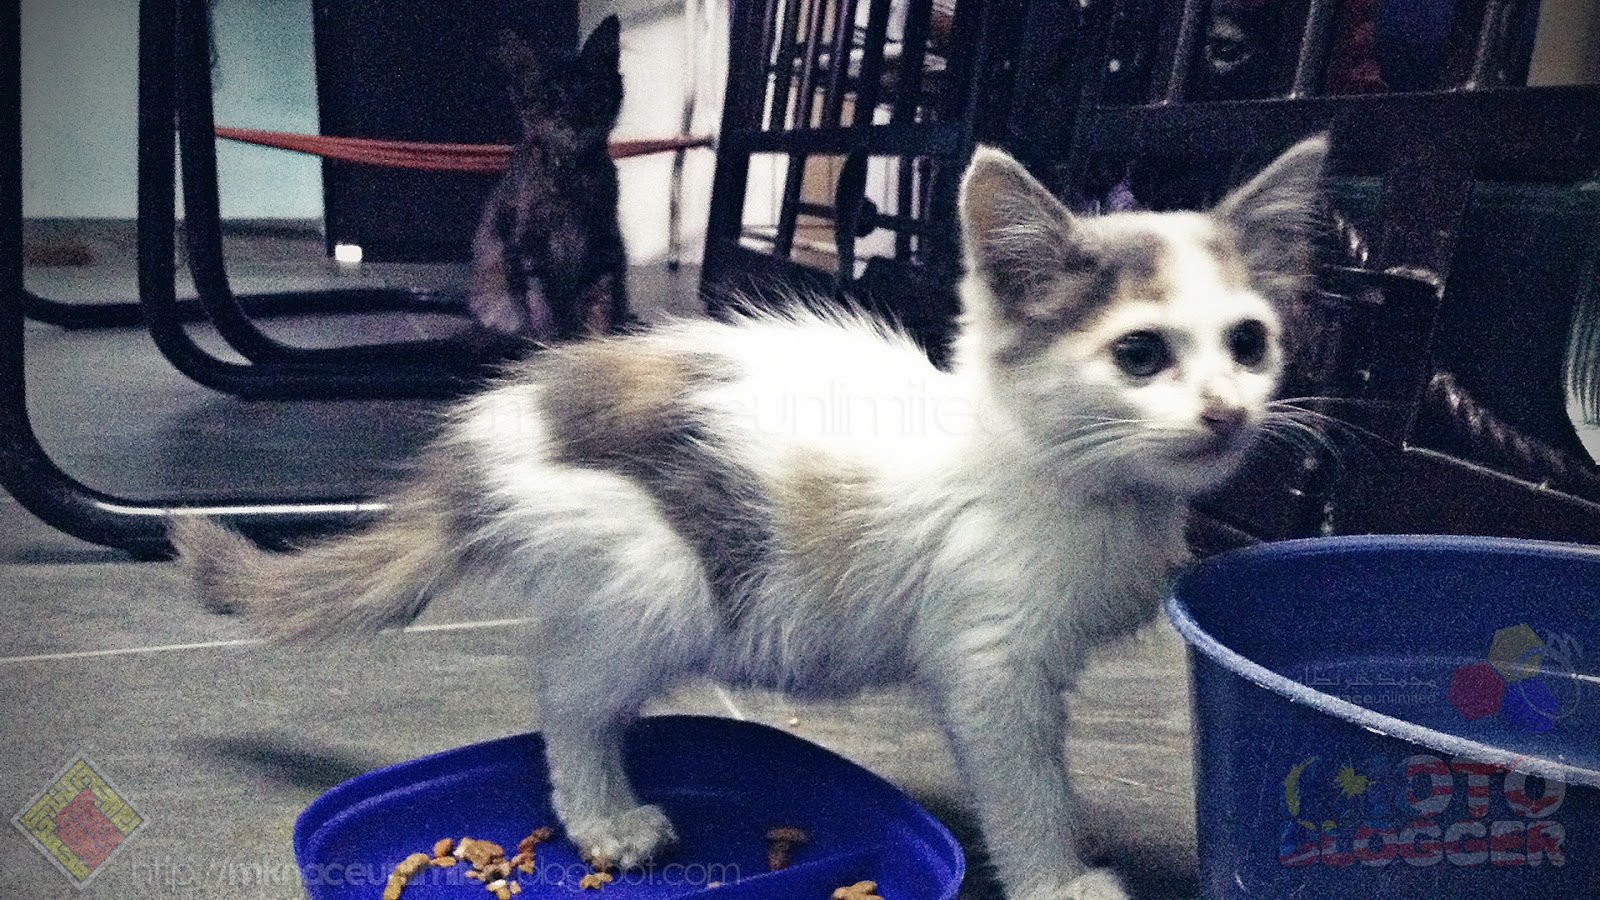 Snowzura 20180829 New Kitten Found Mknace Unlimited The Tcash Vaganza 32 Milo Malaysia Activ Go 2018 08 29 185132